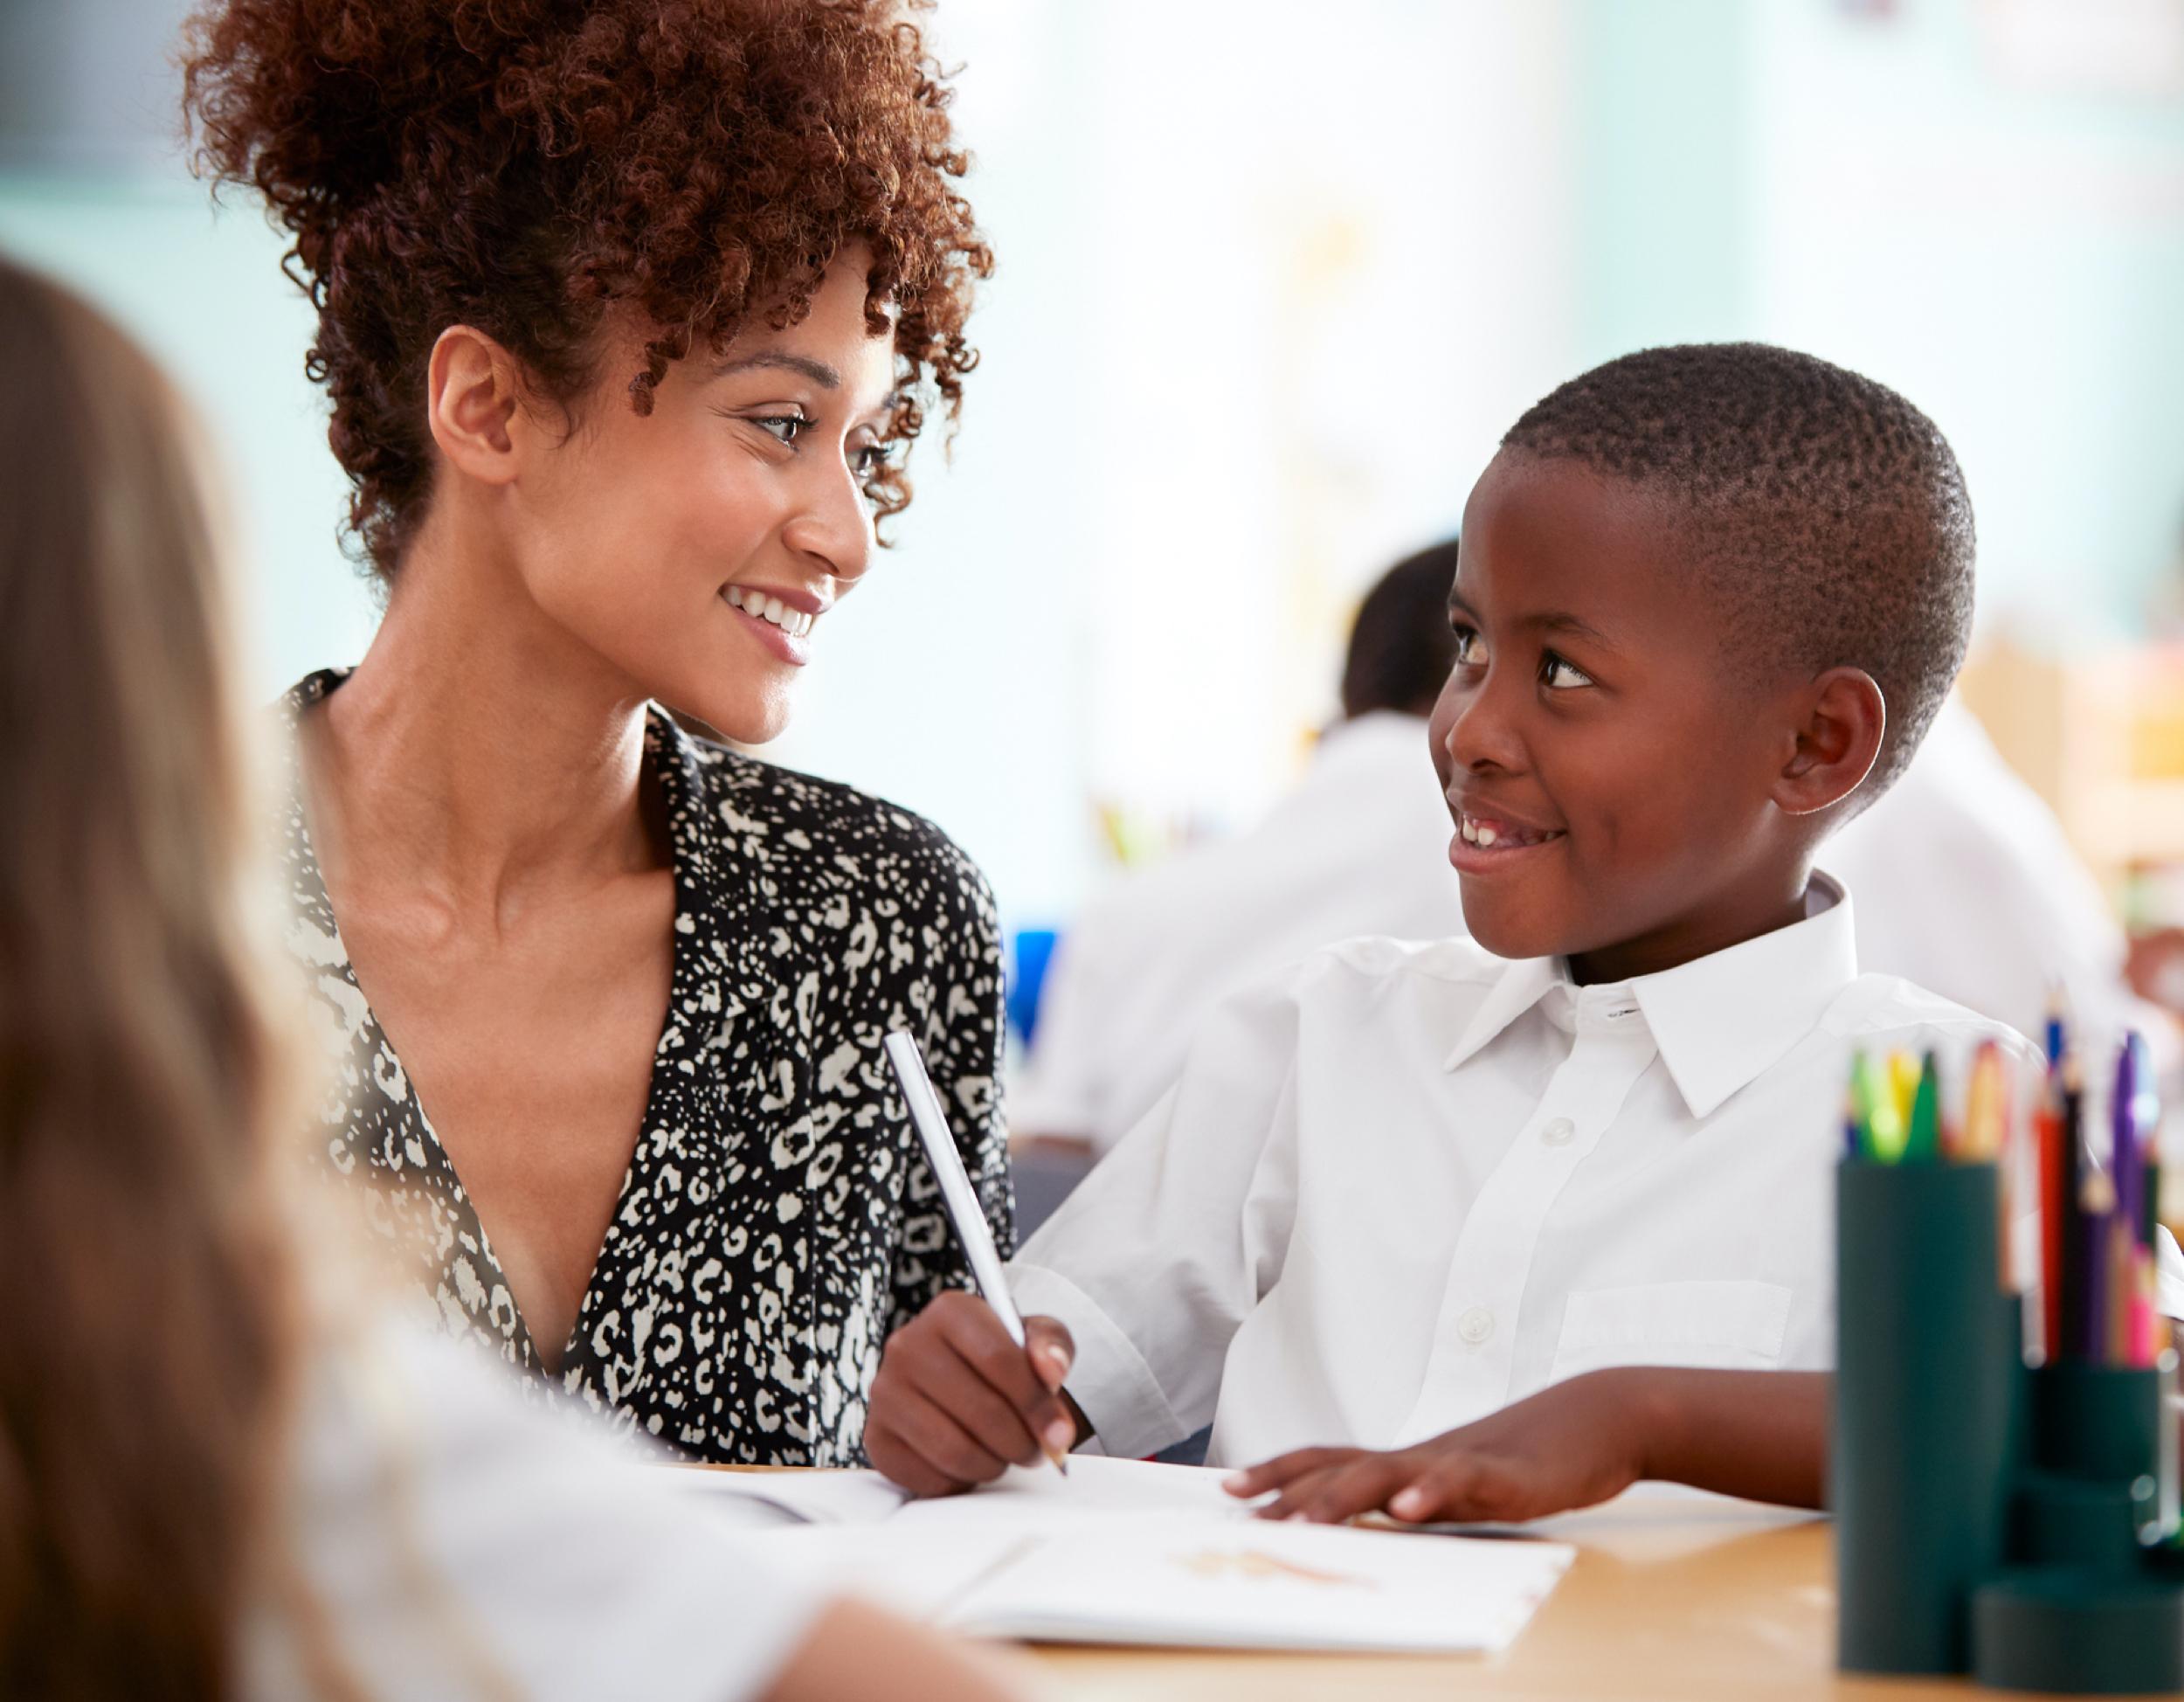 Smiling teacher helps student at desk